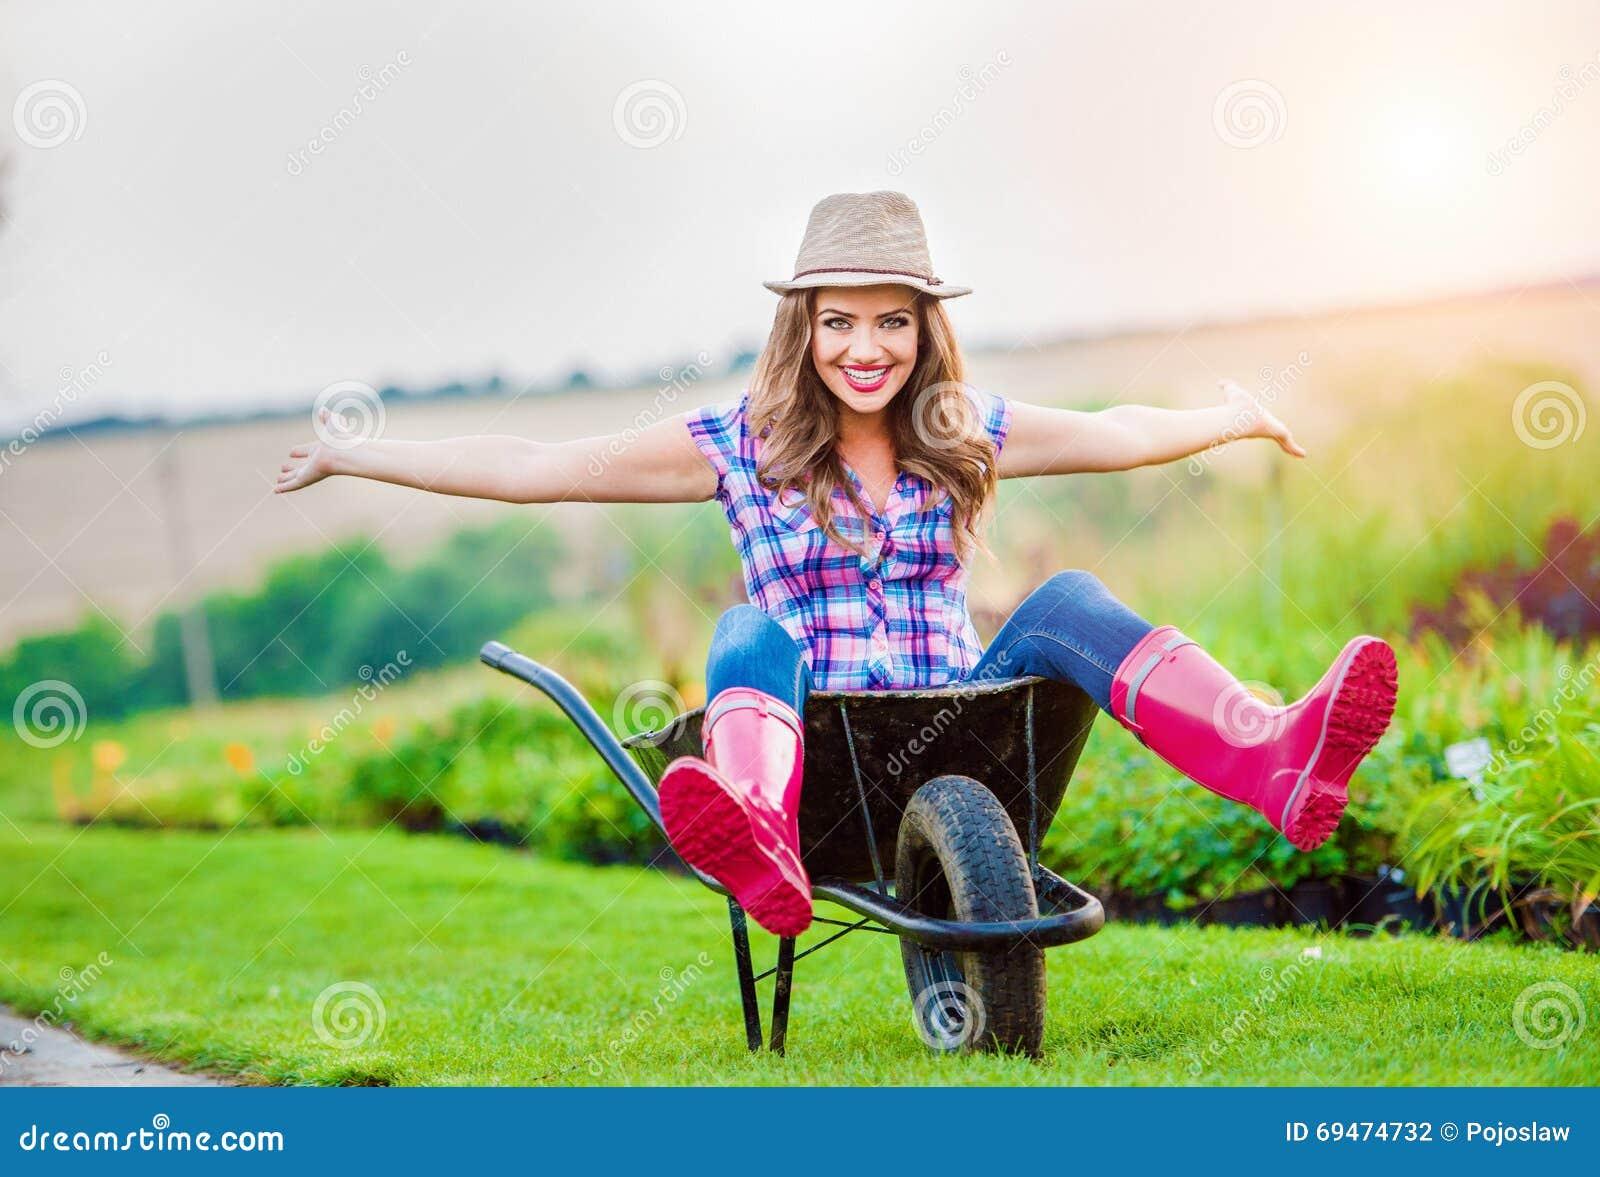 Woman Sitting In Wheelbarrow In Sunny Green Garden Stock ...